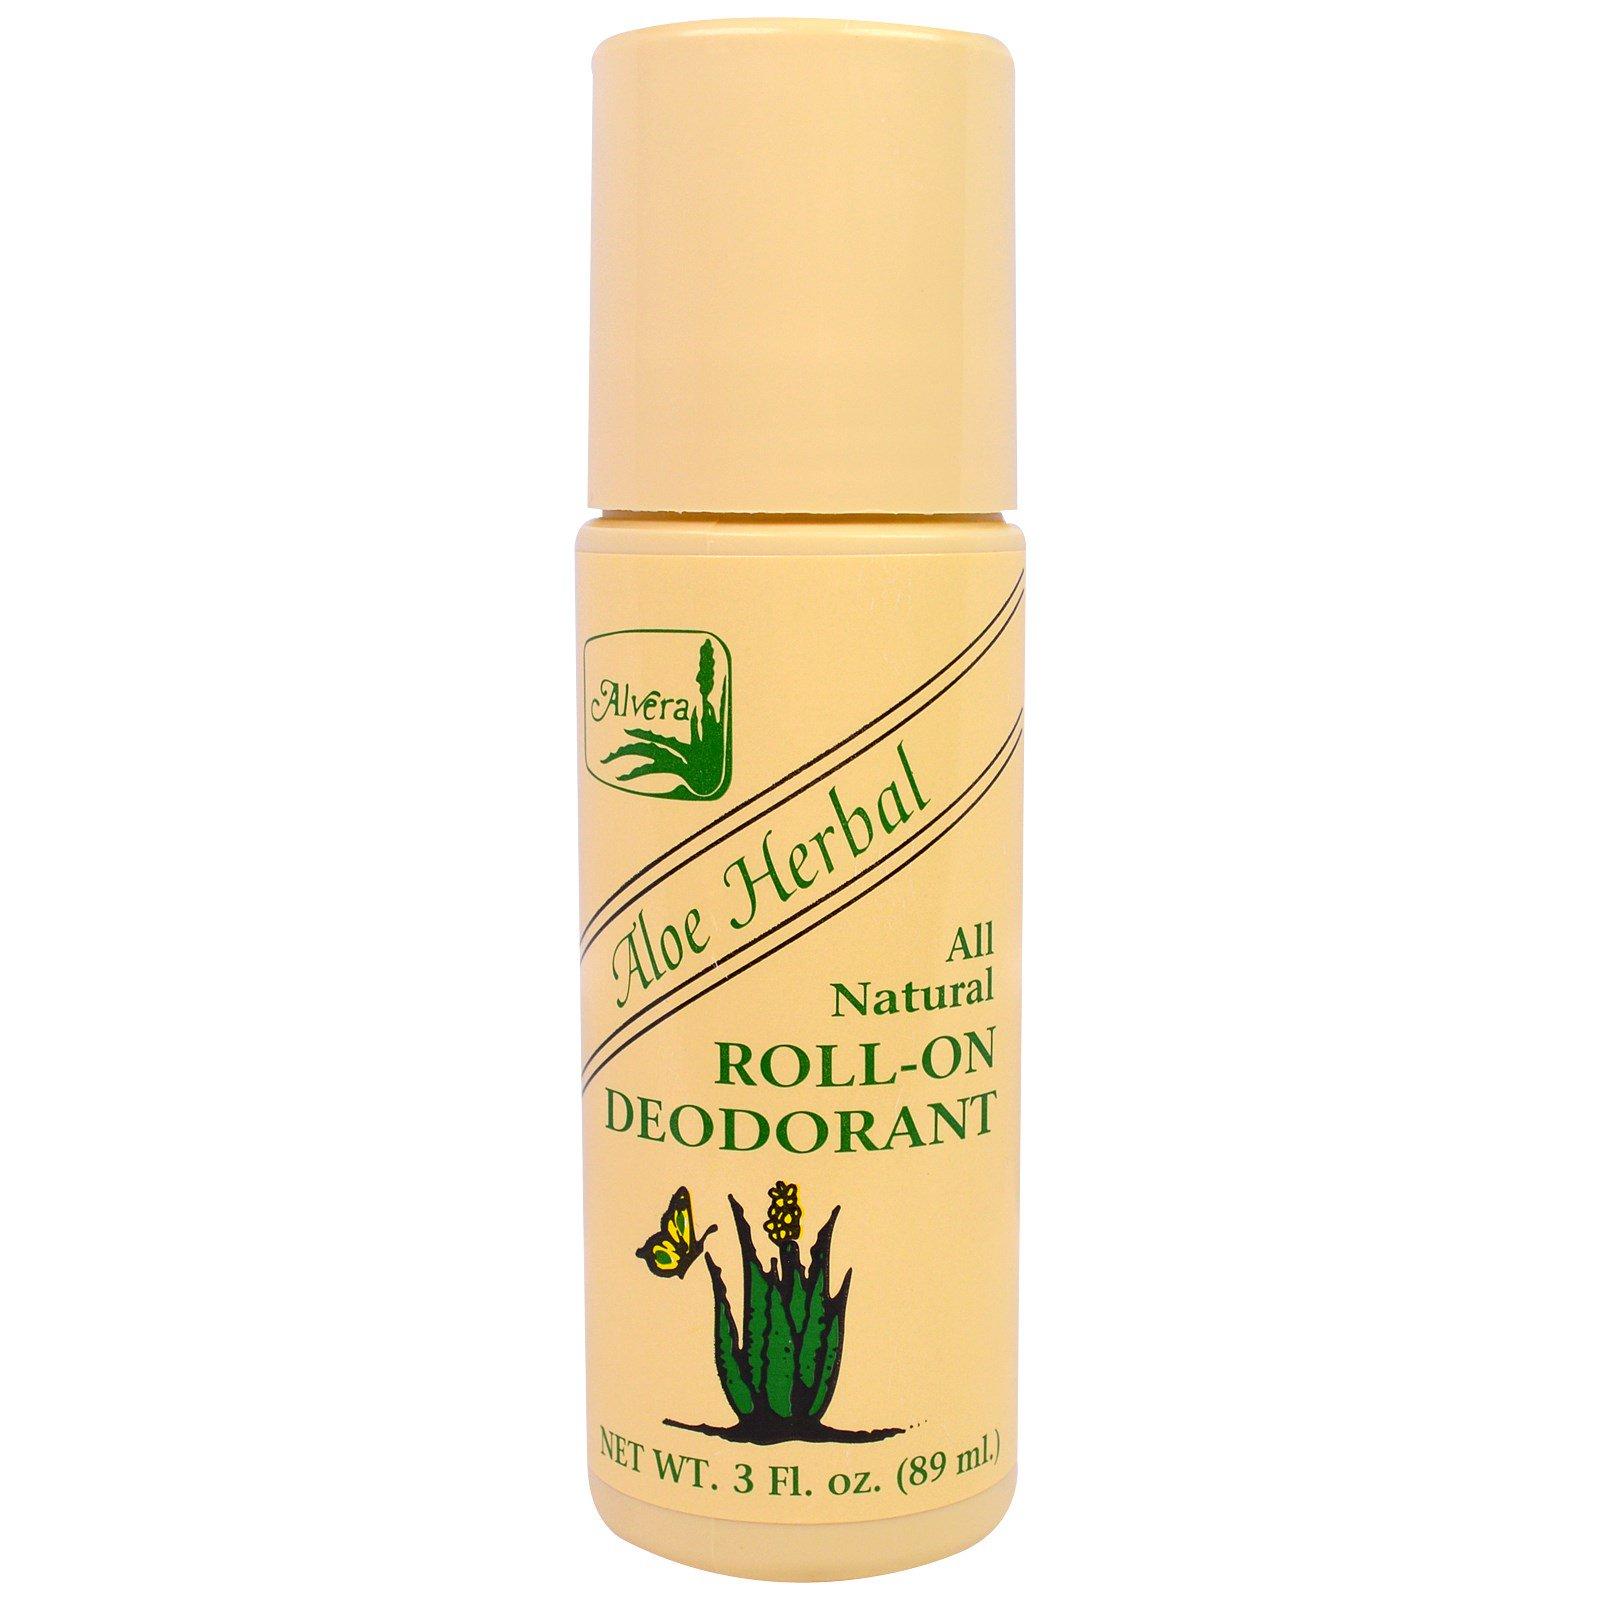 Alvera, Aloe Herbal All Natural Roll-On Deodorant, 3 жидких унций (89 мл)